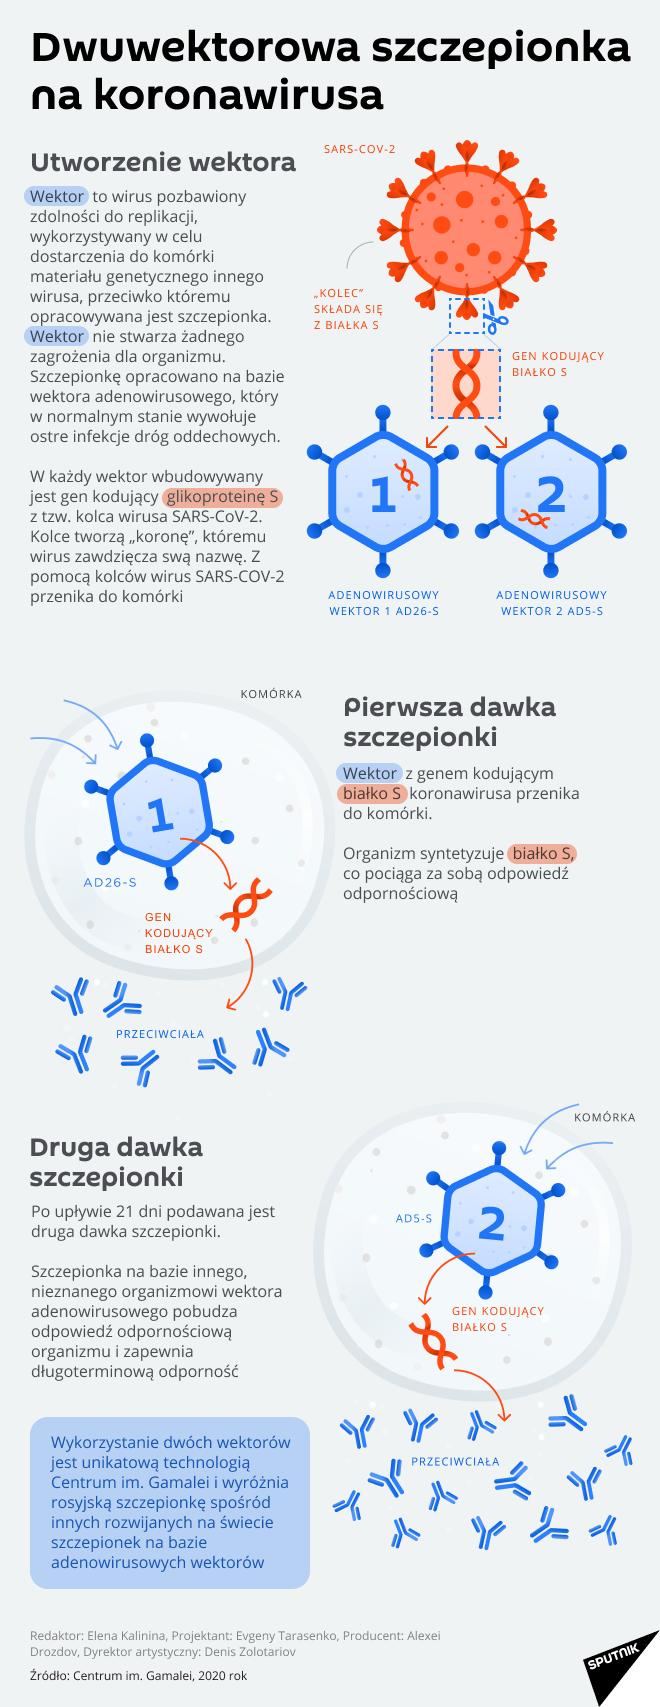 Dwuwektorowa szczepionka na koronawirusa